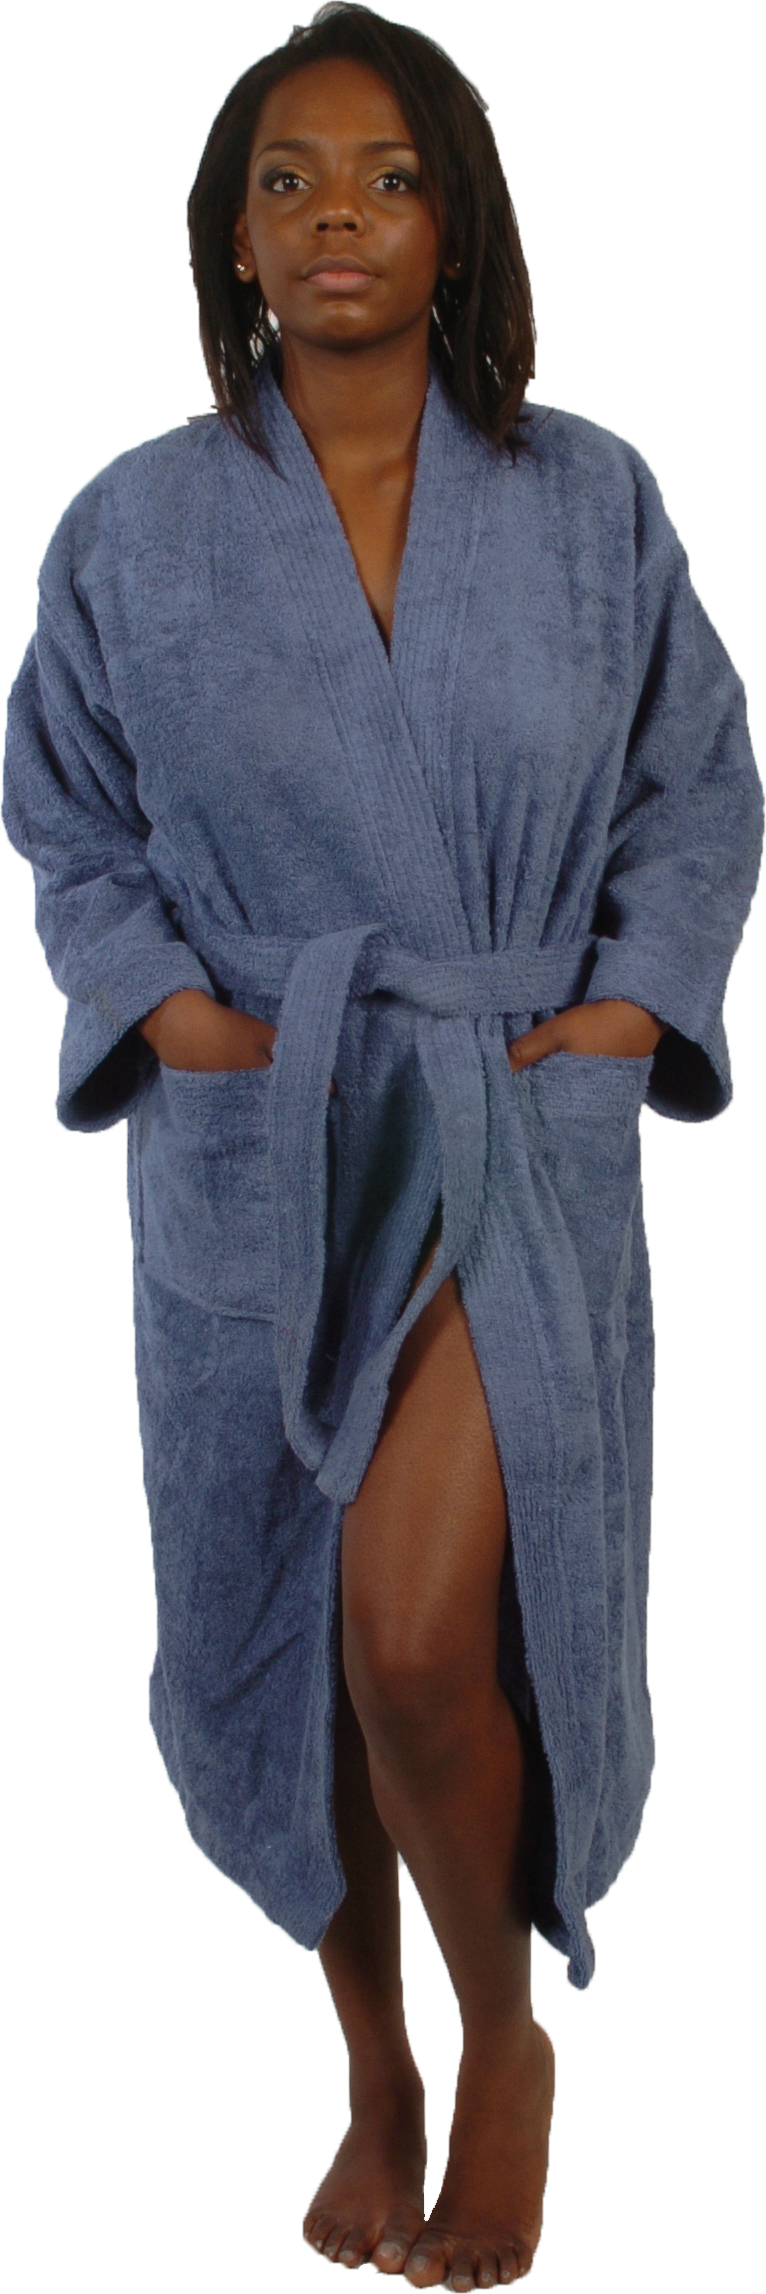 Peignoir col kimono en Coton couleur Bleu jean Taille XL (Bleu Jean)